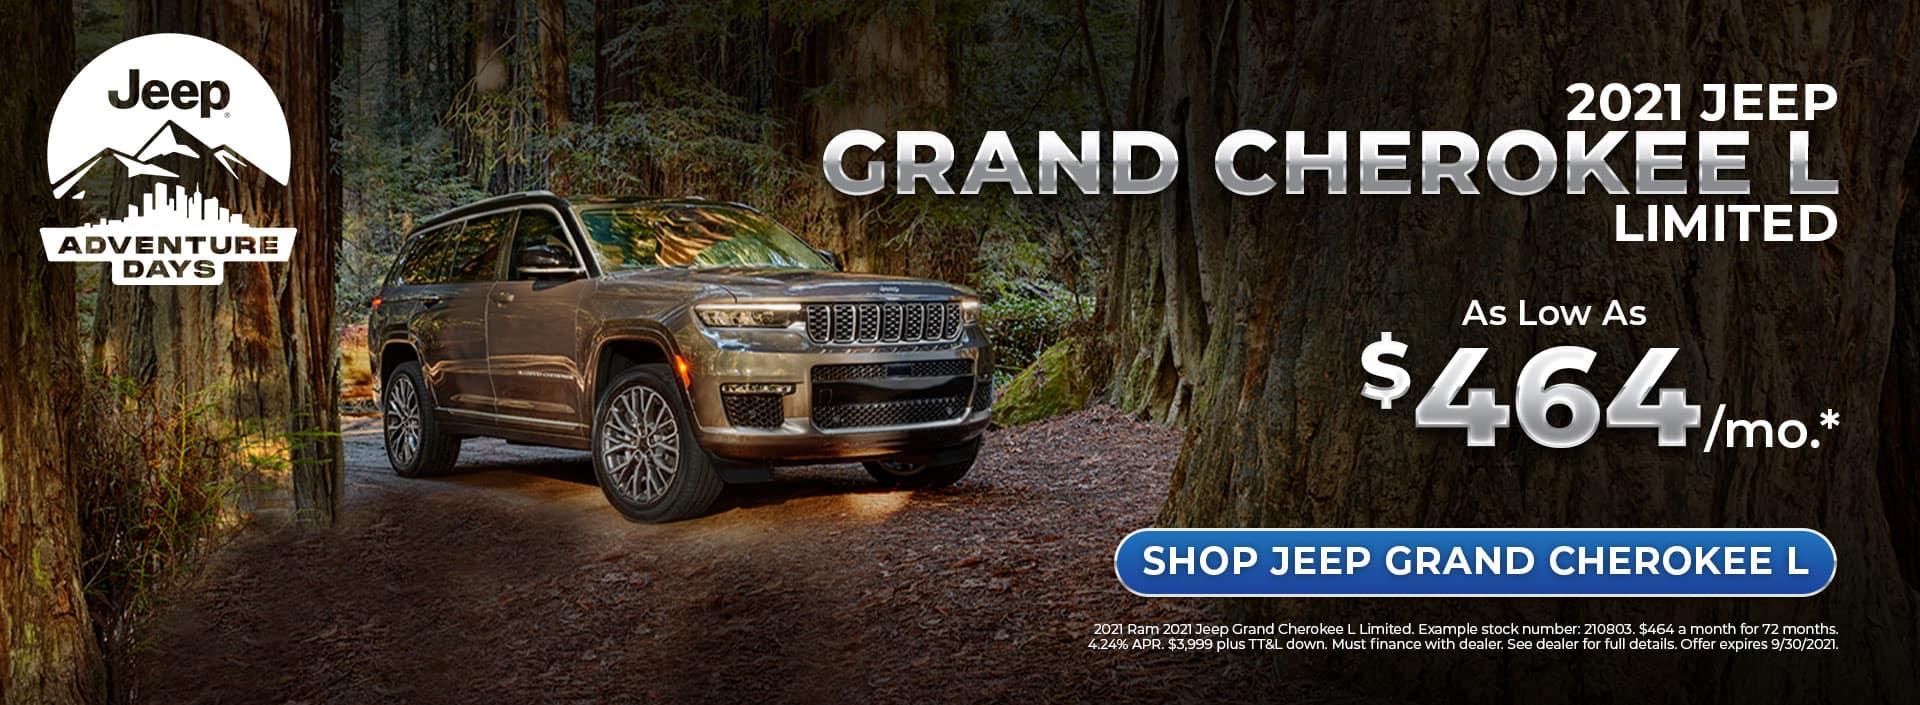 2021 Jeep Grand Cherokee L Offer at Bonham Chrysler in Texas